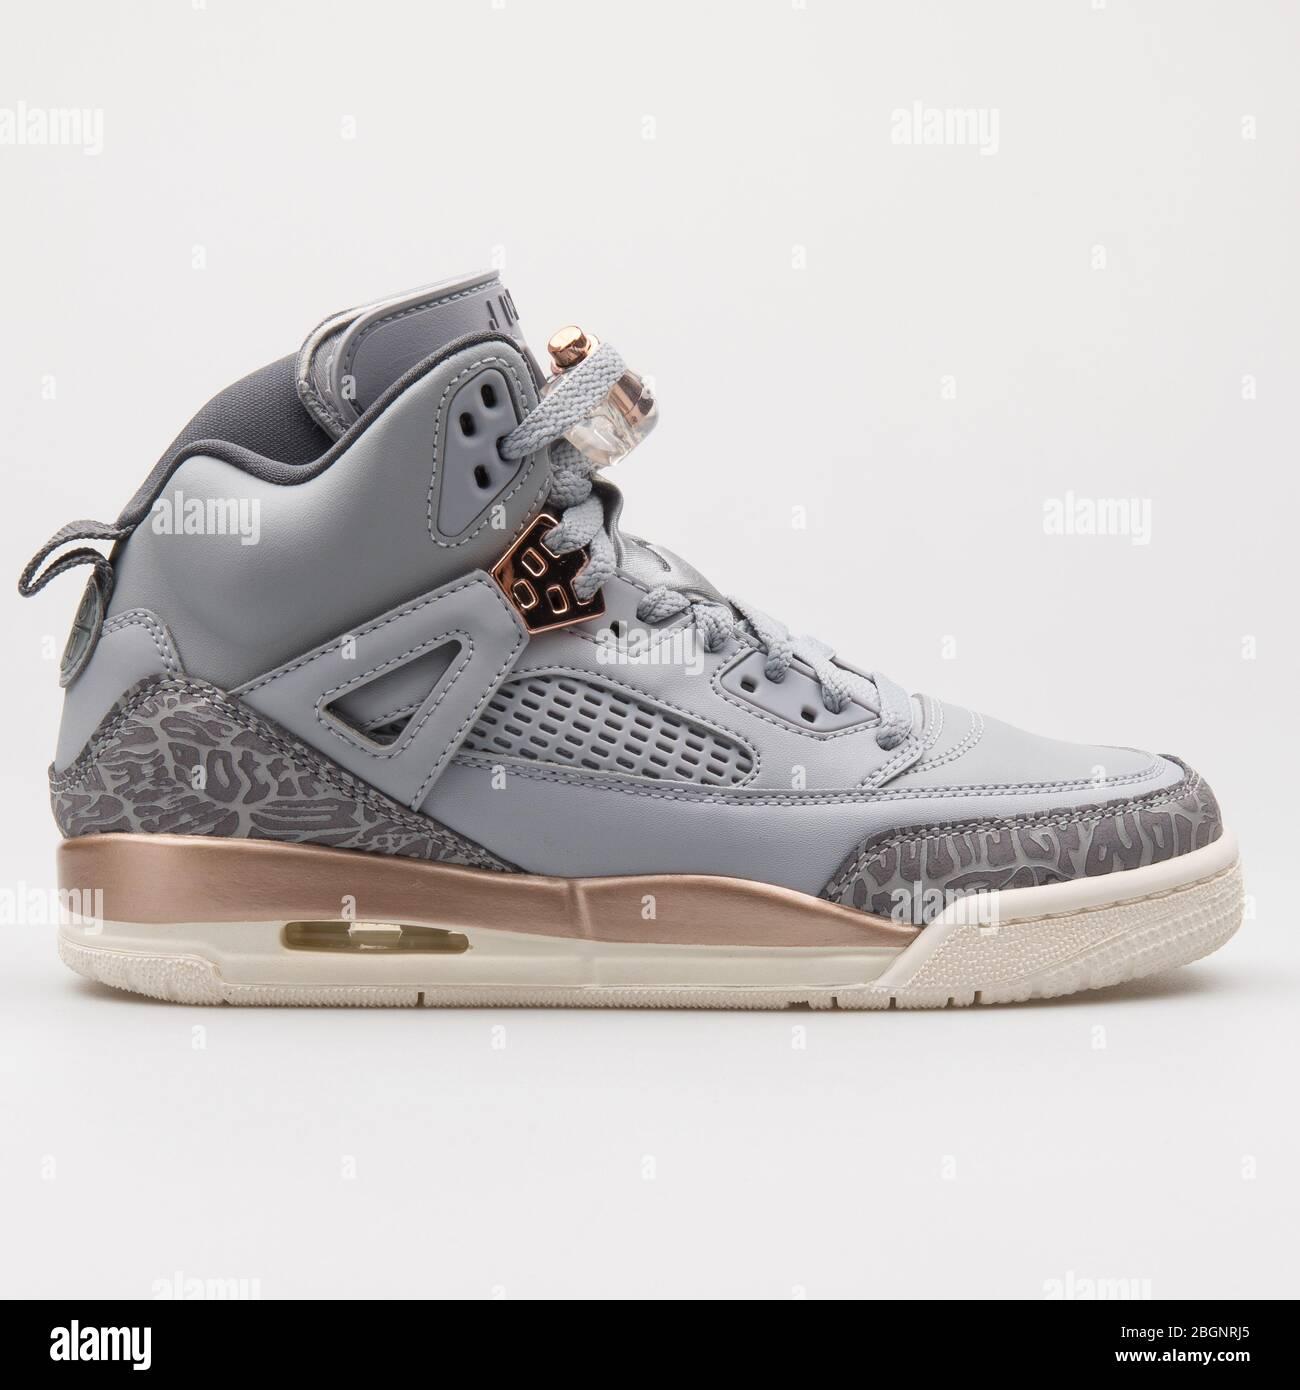 2017: Nike Air Jordan Spizike wolf grey